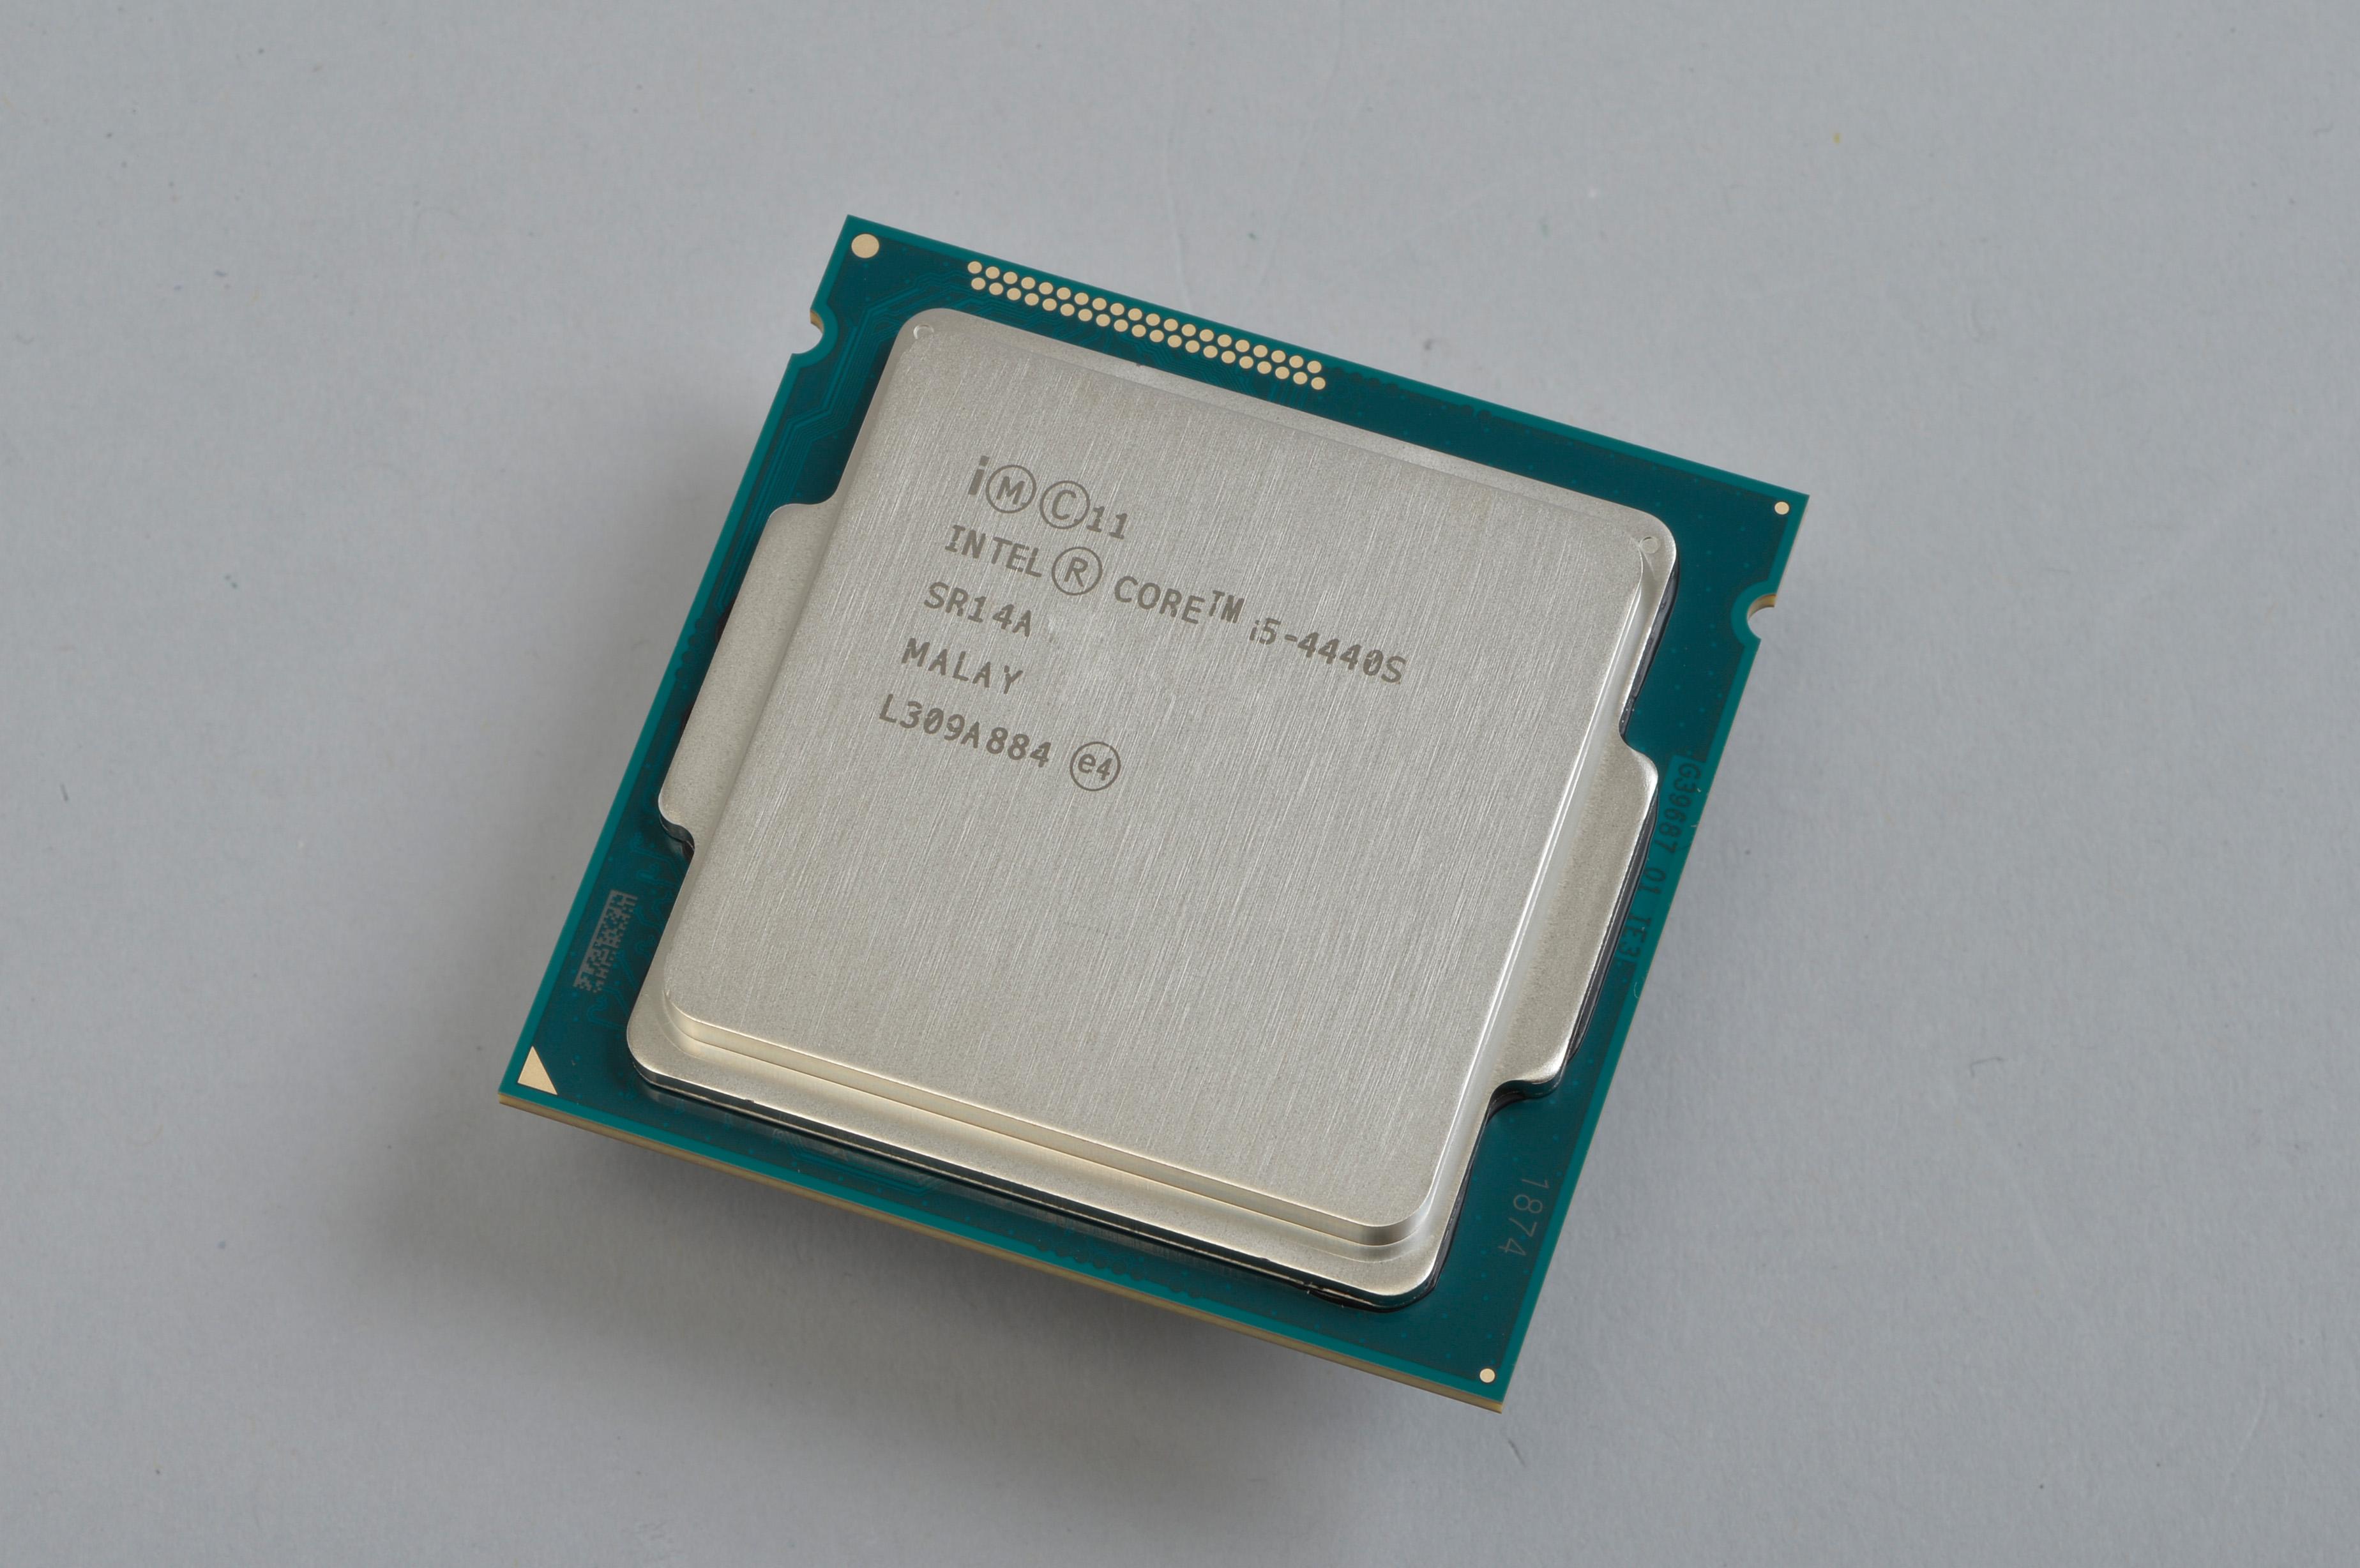 "Intel Core i5-4440S<br class="""">実売価格:21,000円前後"